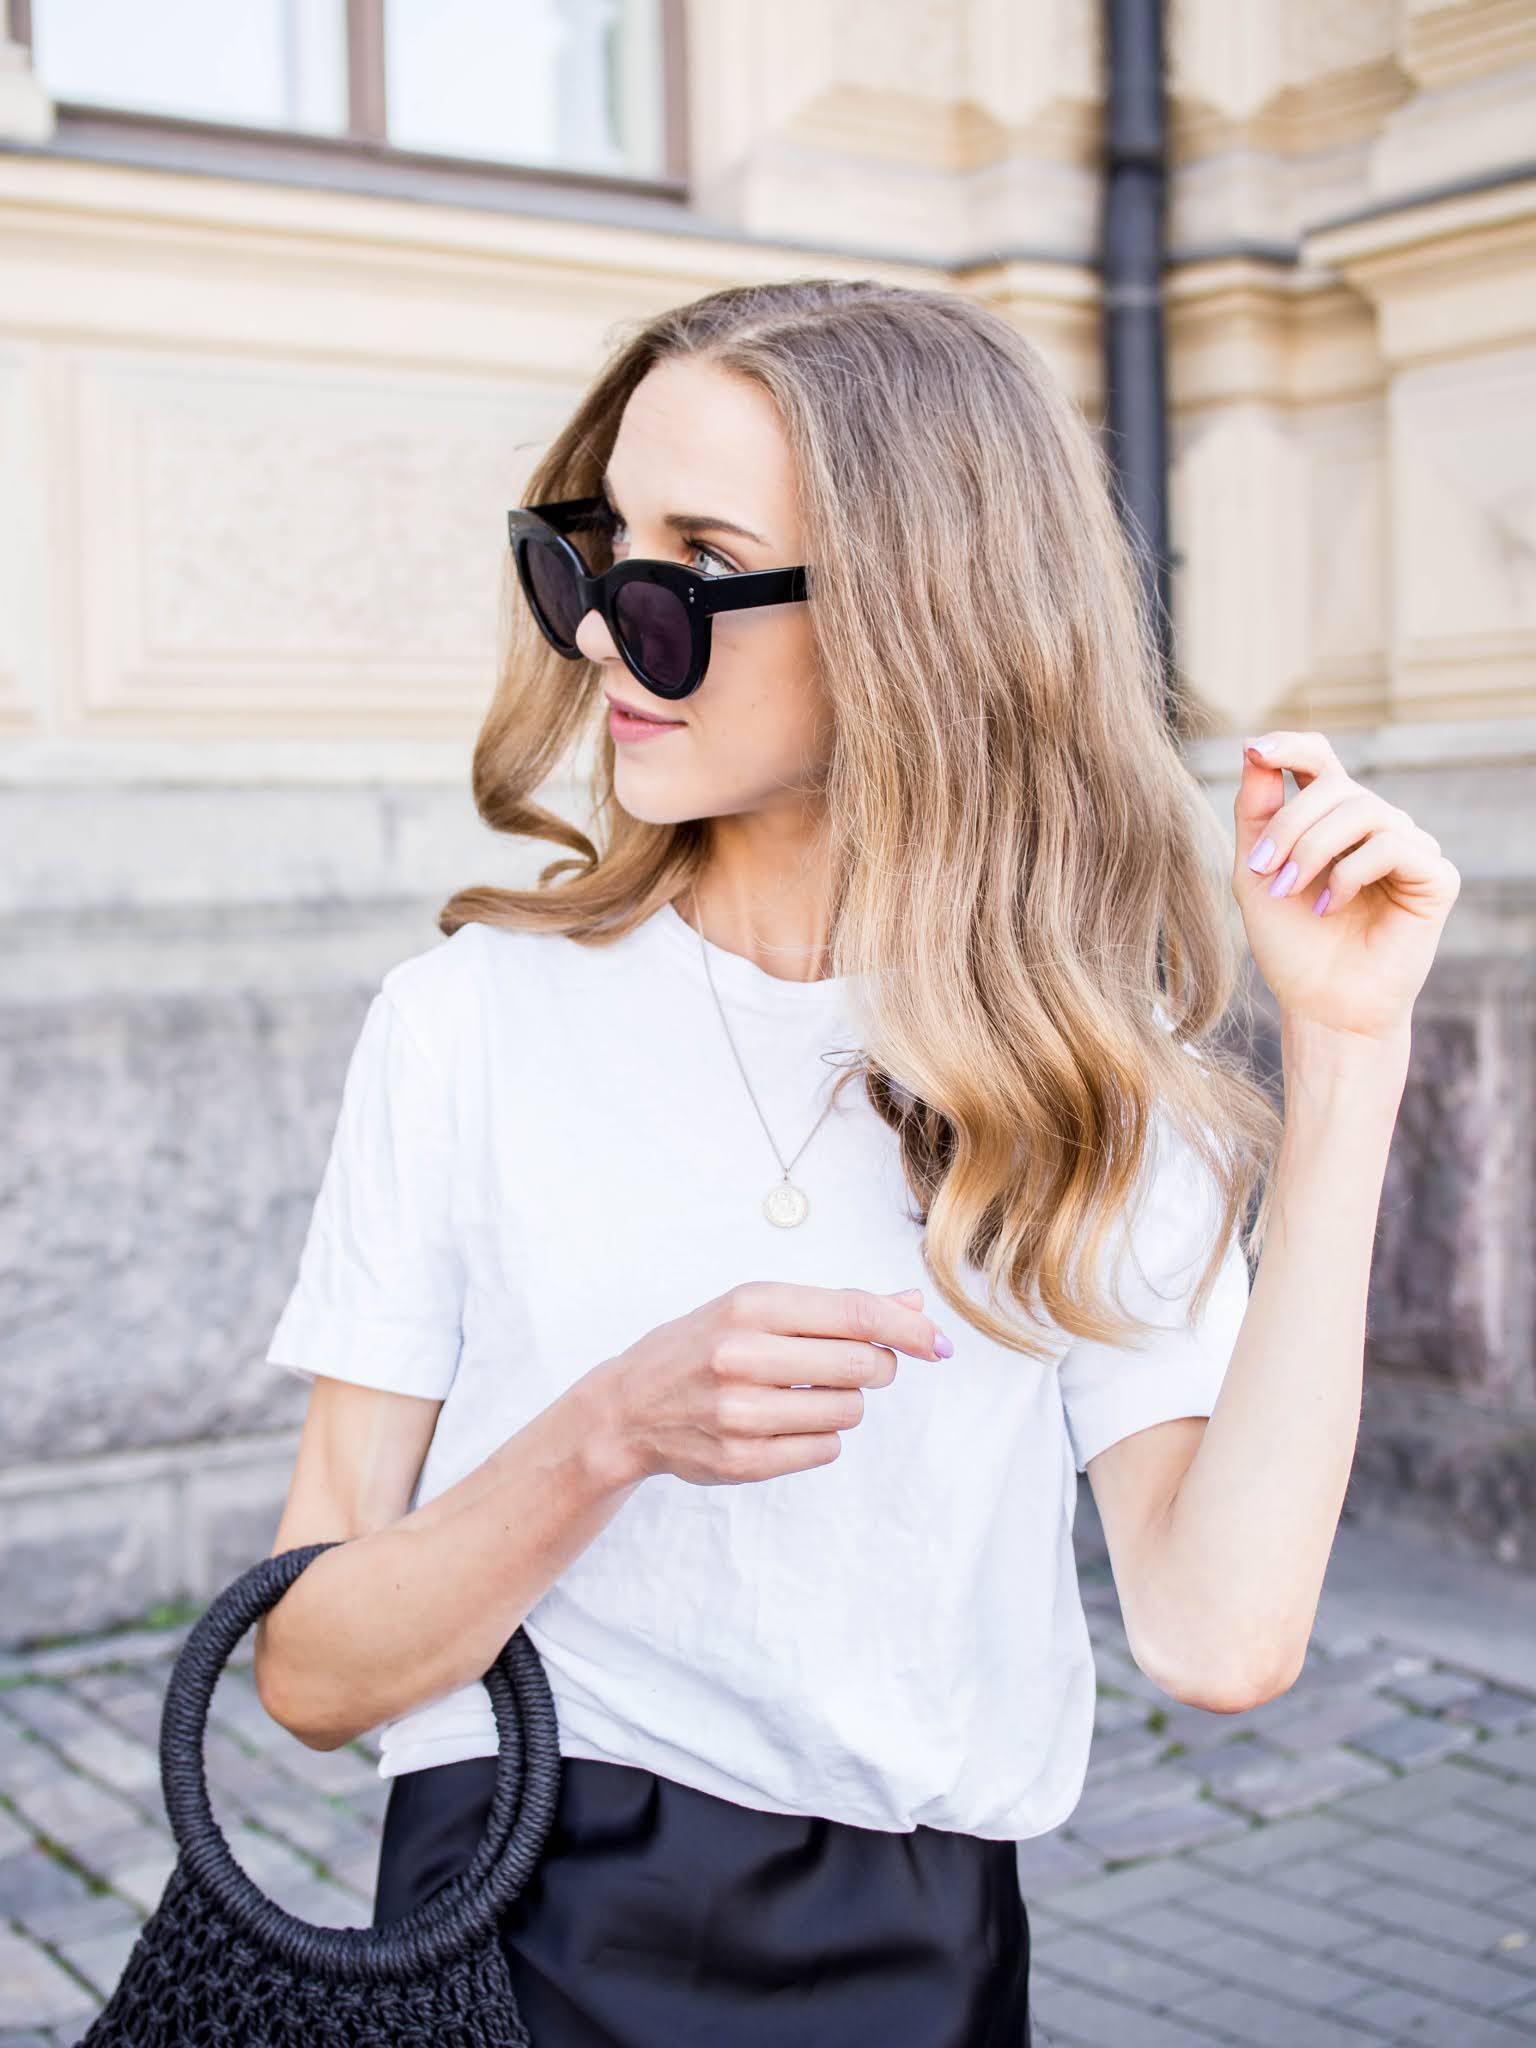 H&M Men's white t-shirt, ASOS Design coin necklace - H&M miesten valkoinen t-paita, ASOS kultainen kaulakoru